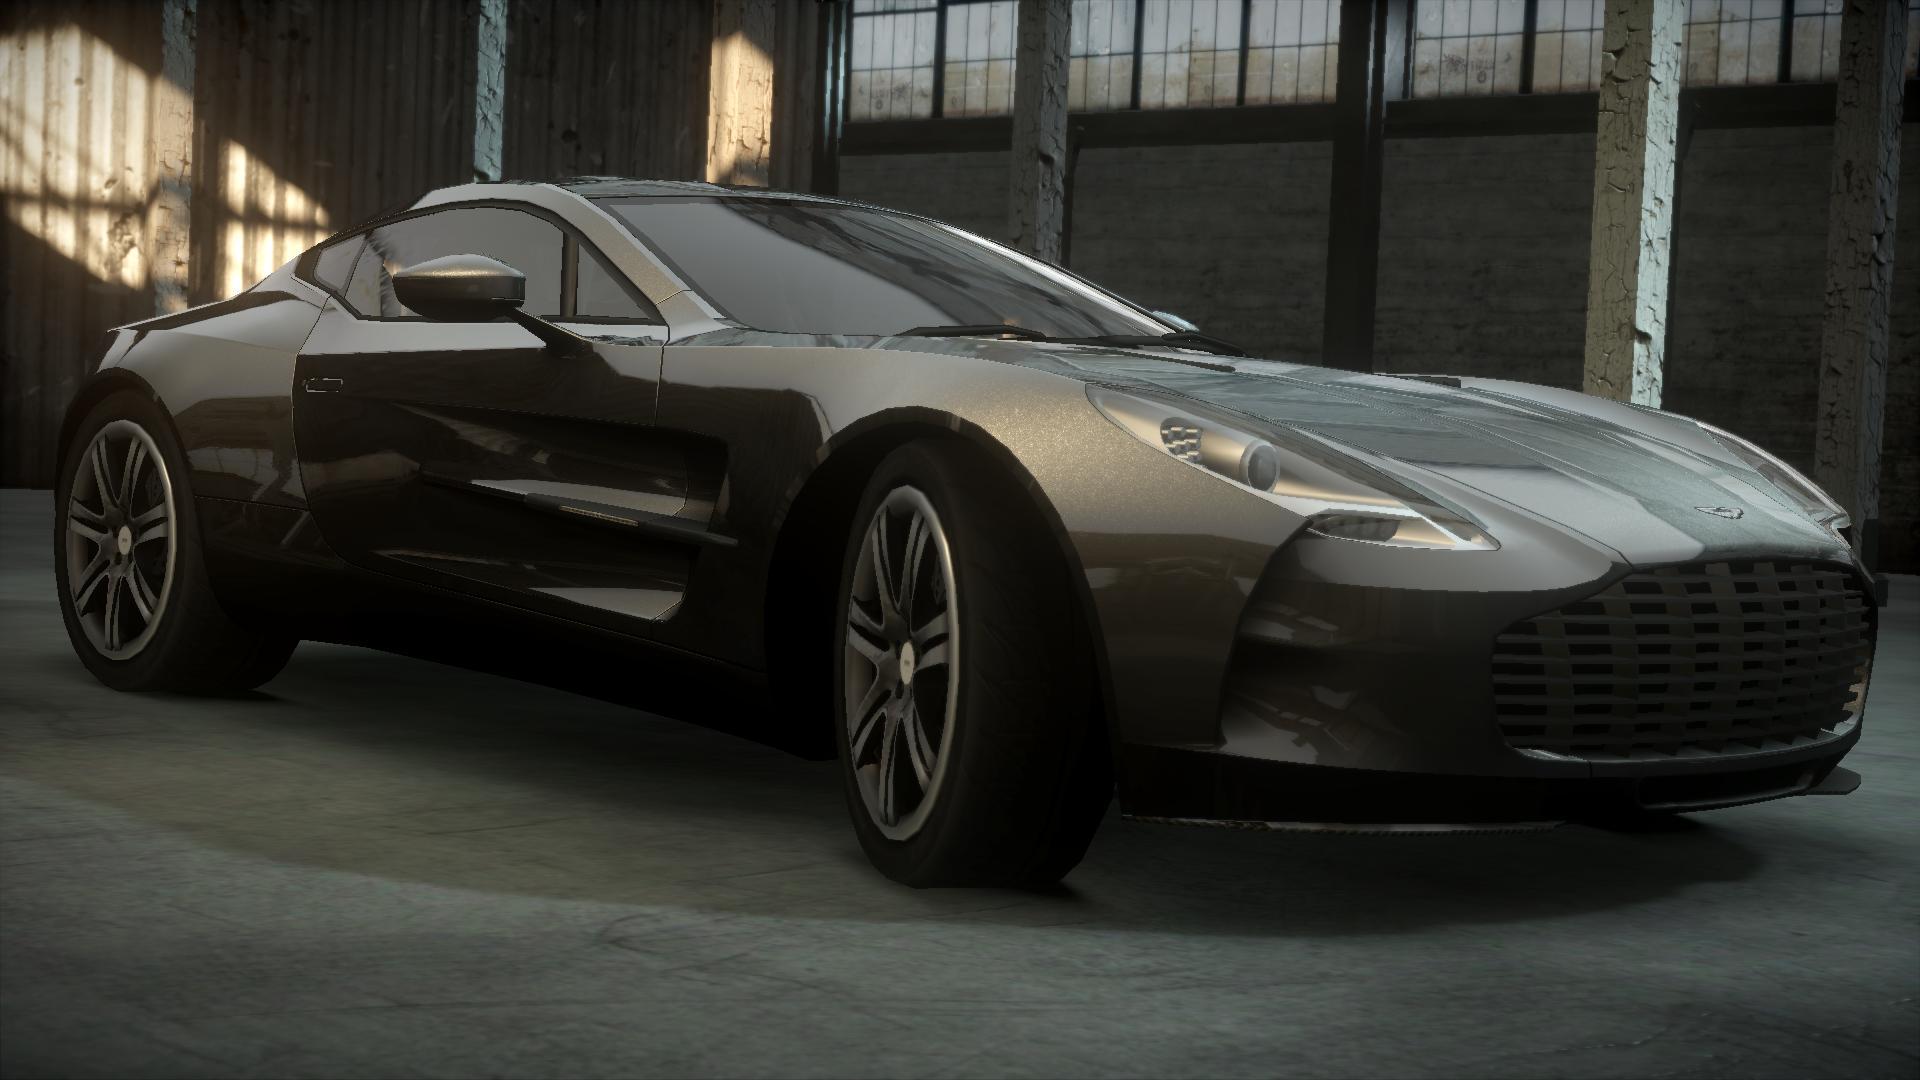 Aston Martin One Need For Speed Wiki FANDOM Powered By Wikia - Aston martin one